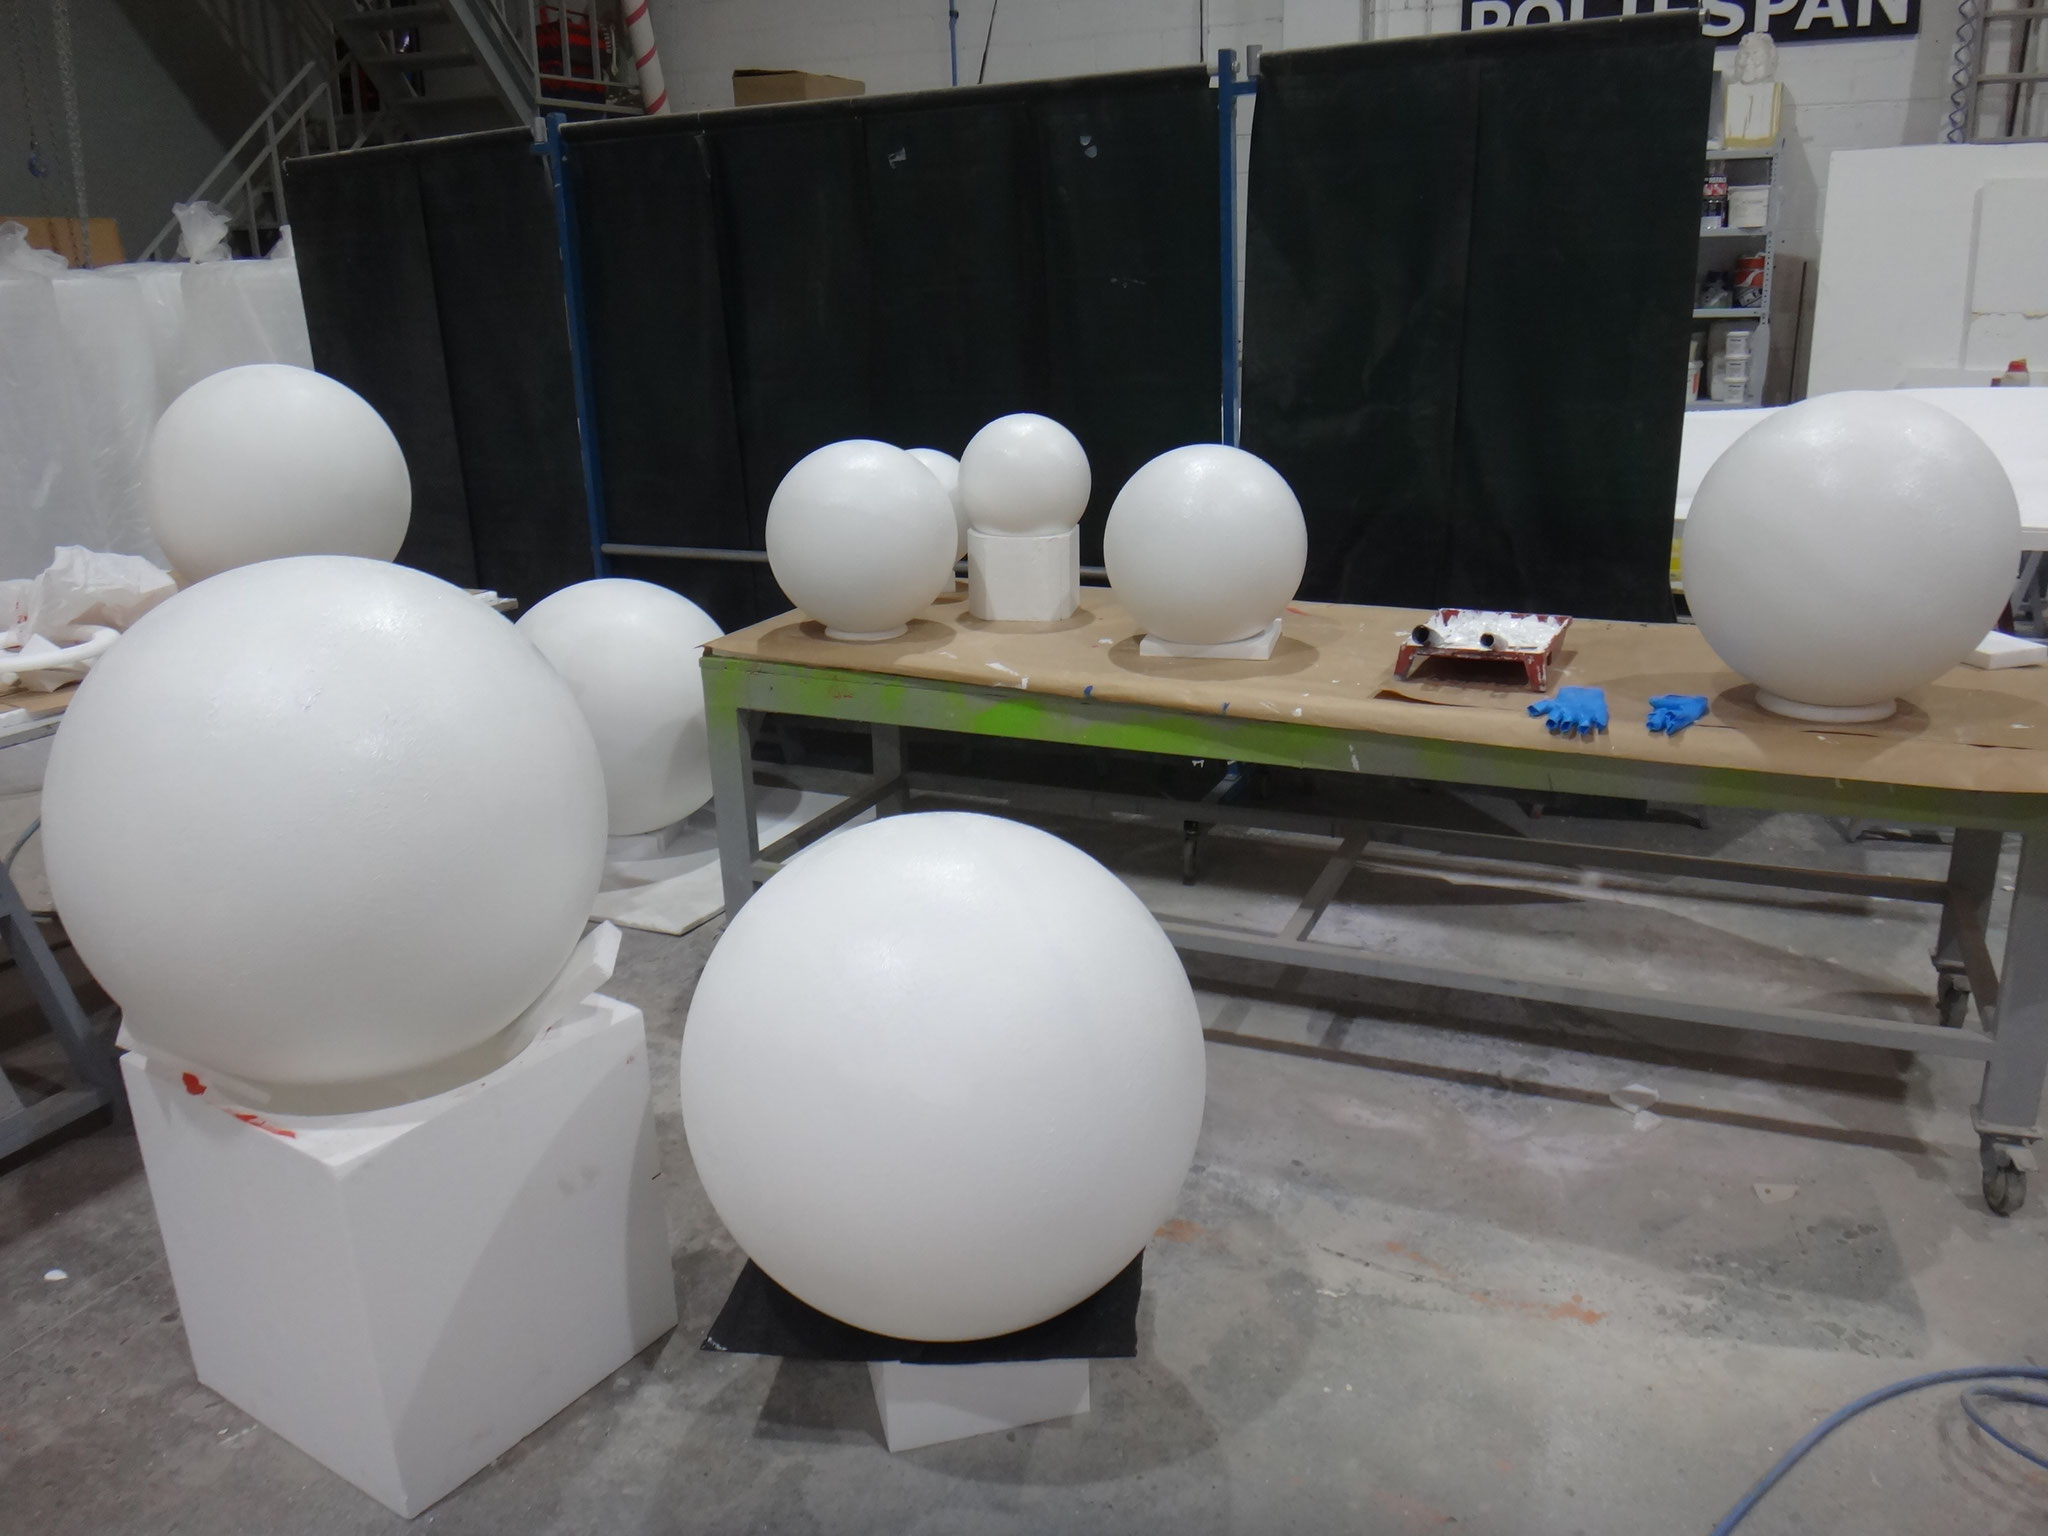 Esferas revestidas, para pintar planetas